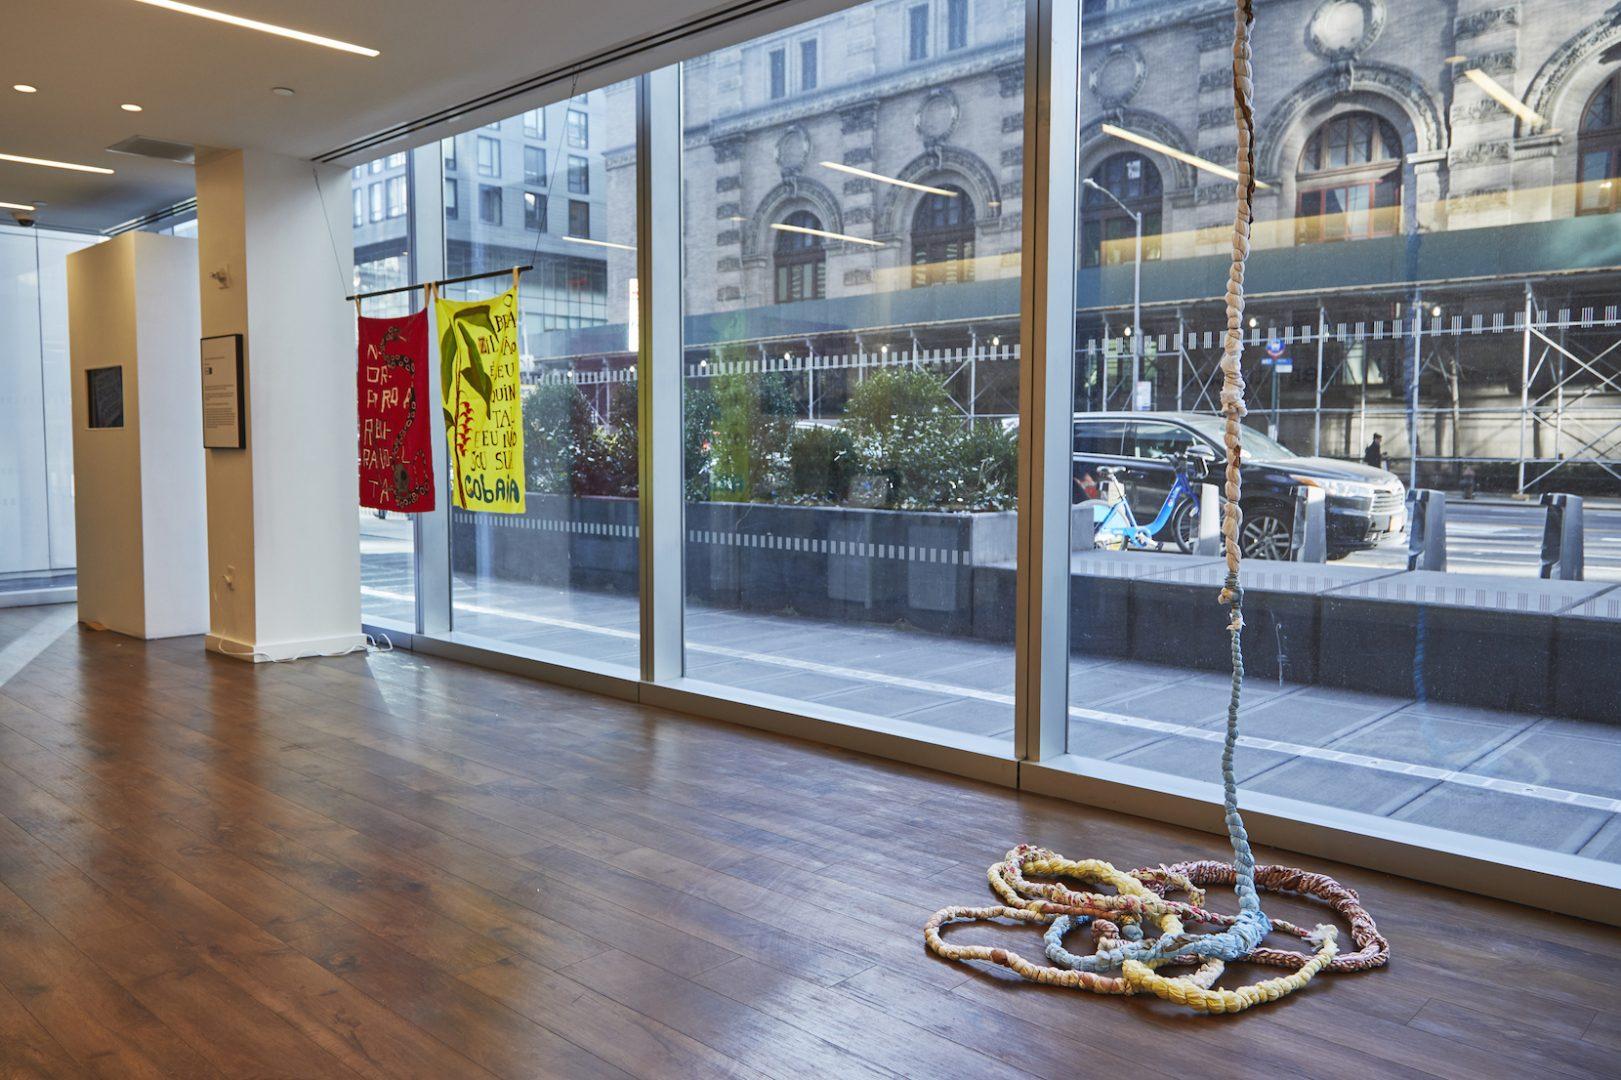 Igor Vidor, Against Again: Art under attack in Brazil , 2020, Installation view, Shiva Gallery, New York